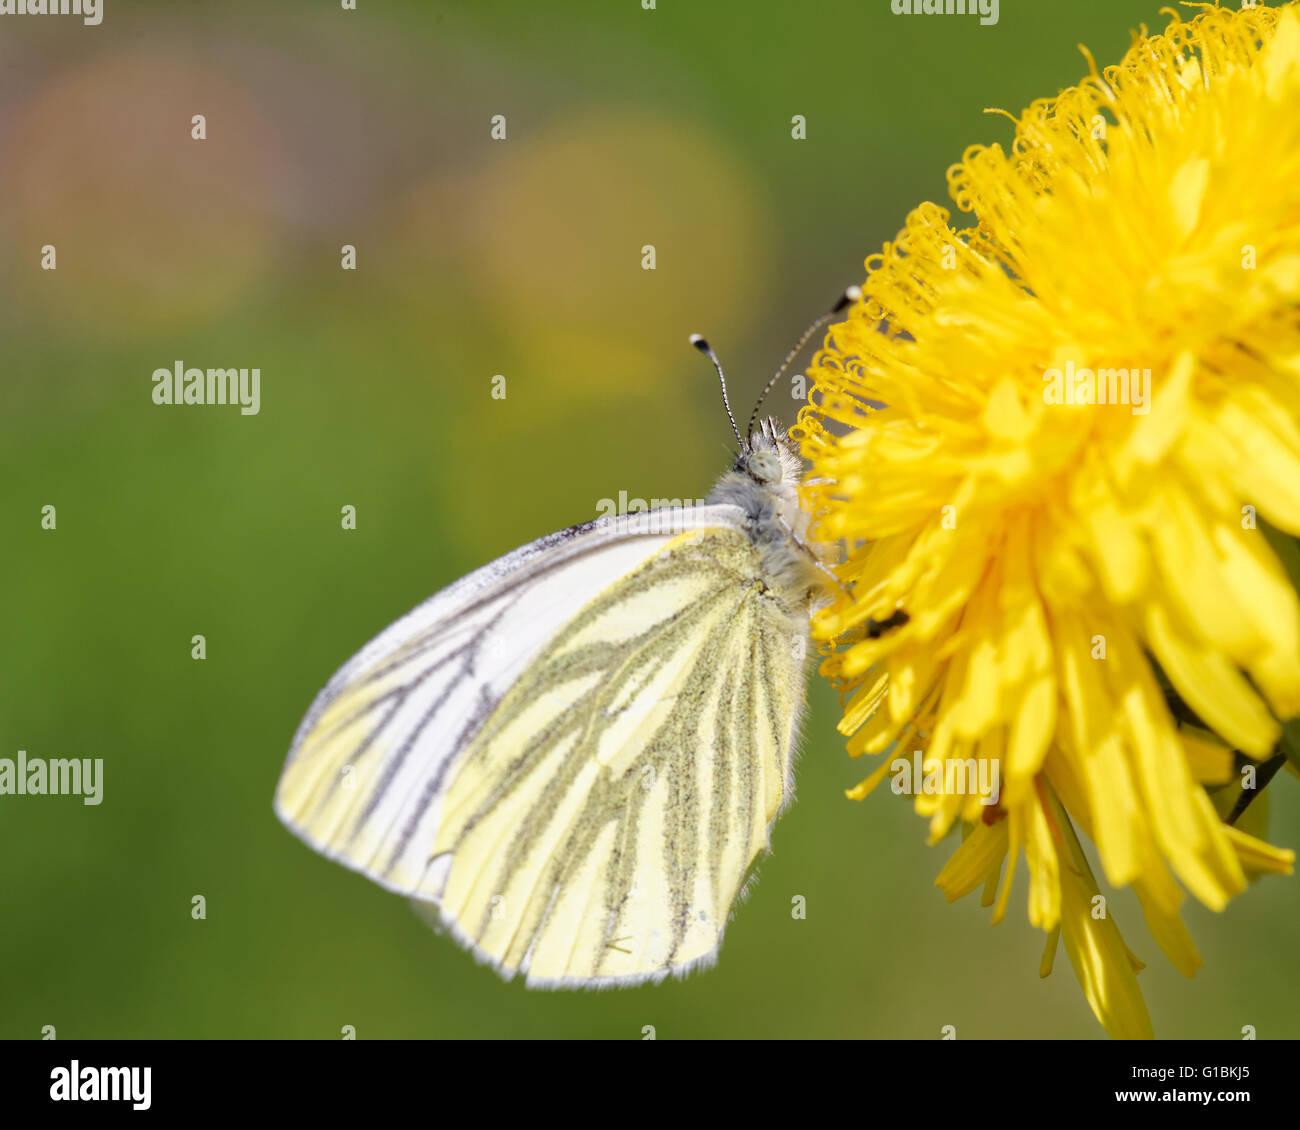 Green-veined white (Pieris napi) butterfly on dandelion flower. - Stock Image